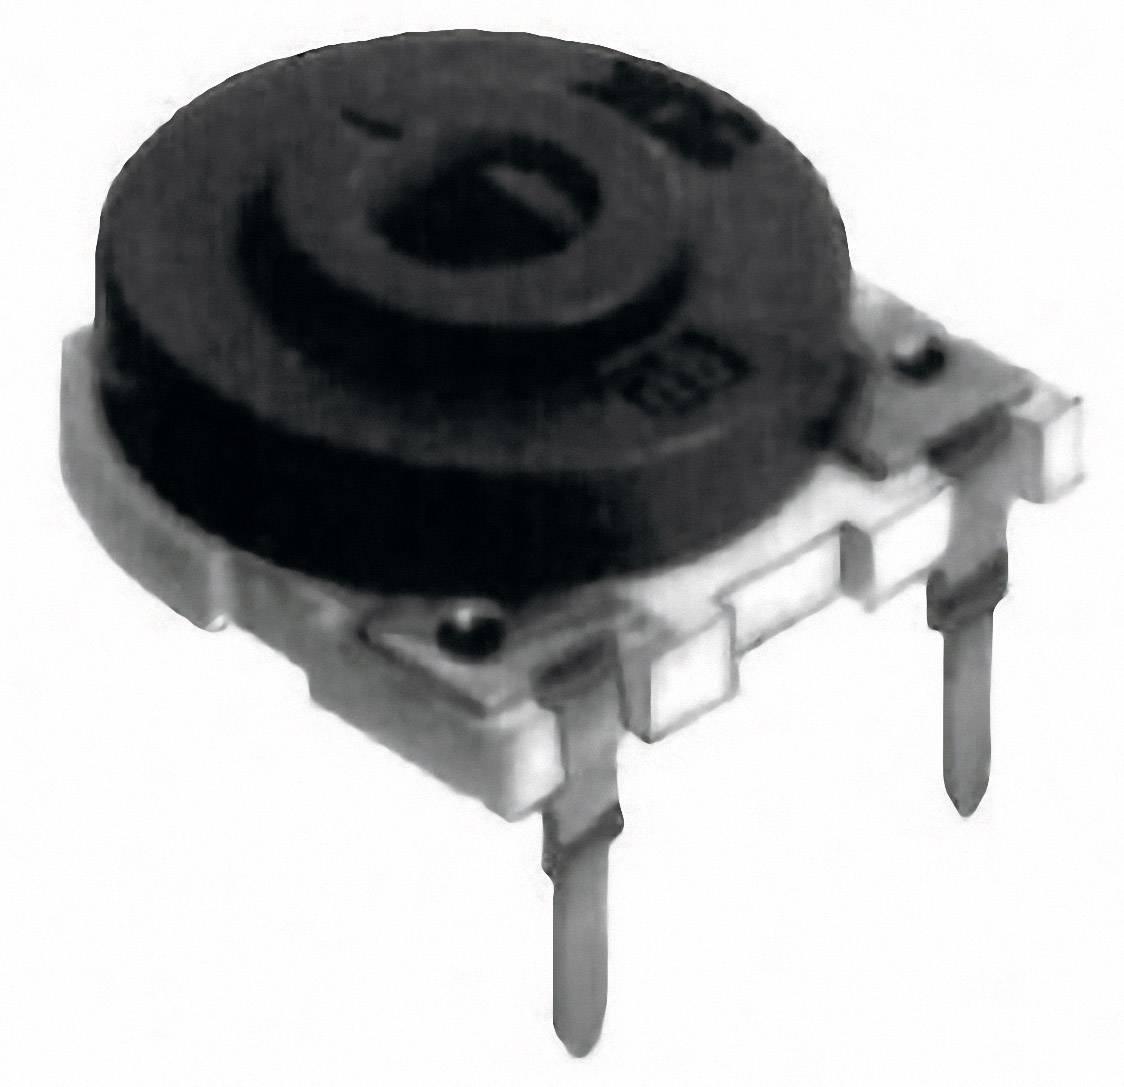 Cermetový trimer TT Electro, 2041462705, 1 MΩ, 0.5 W, ± 20%